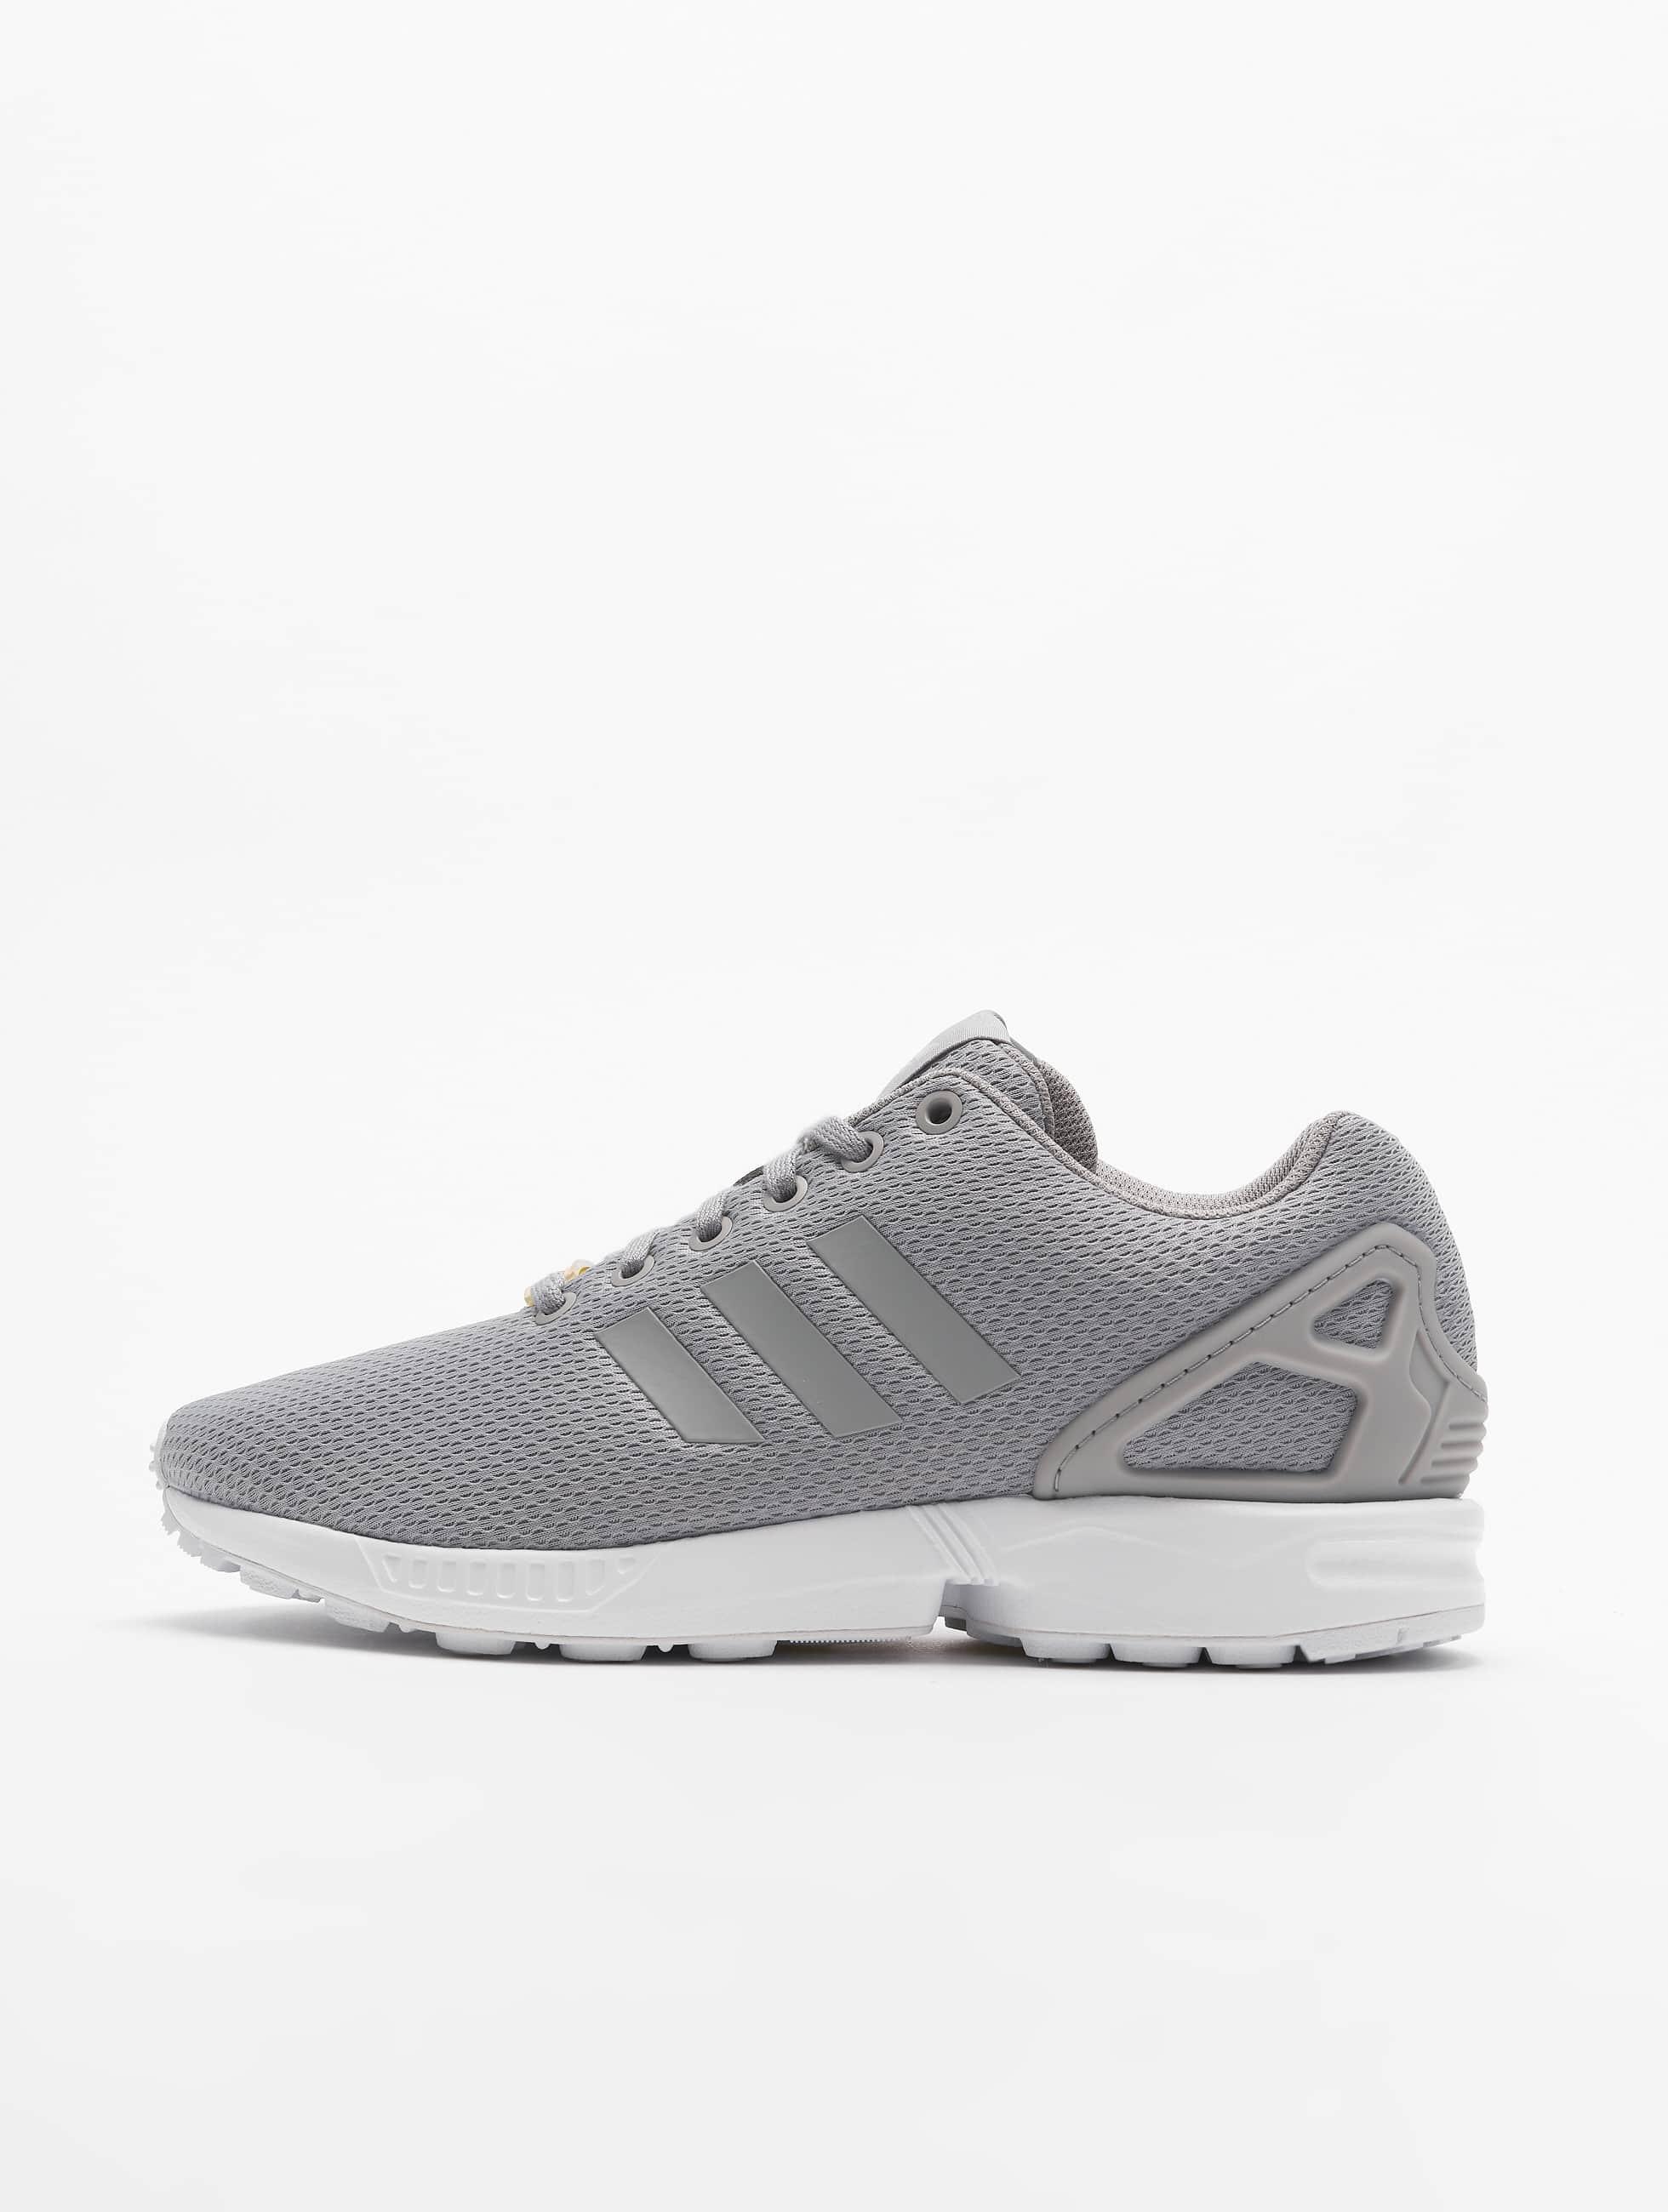 Weiß Adidas Adidas Grau Weiß Sneaker Sneaker Grau Gress Grau Gress Sneaker Adidas bf7yYg6